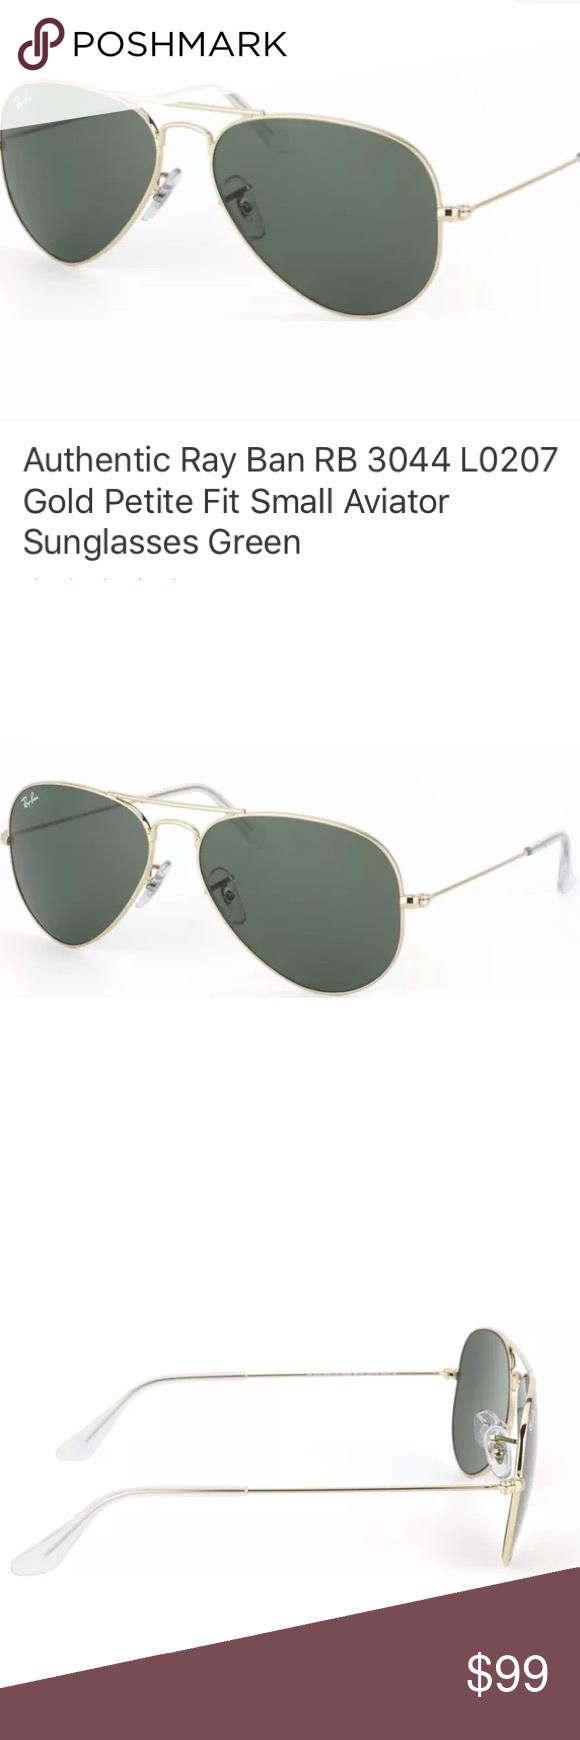 9603a8786c Rb3044 L0207 Black Sunglasses « One More Soul